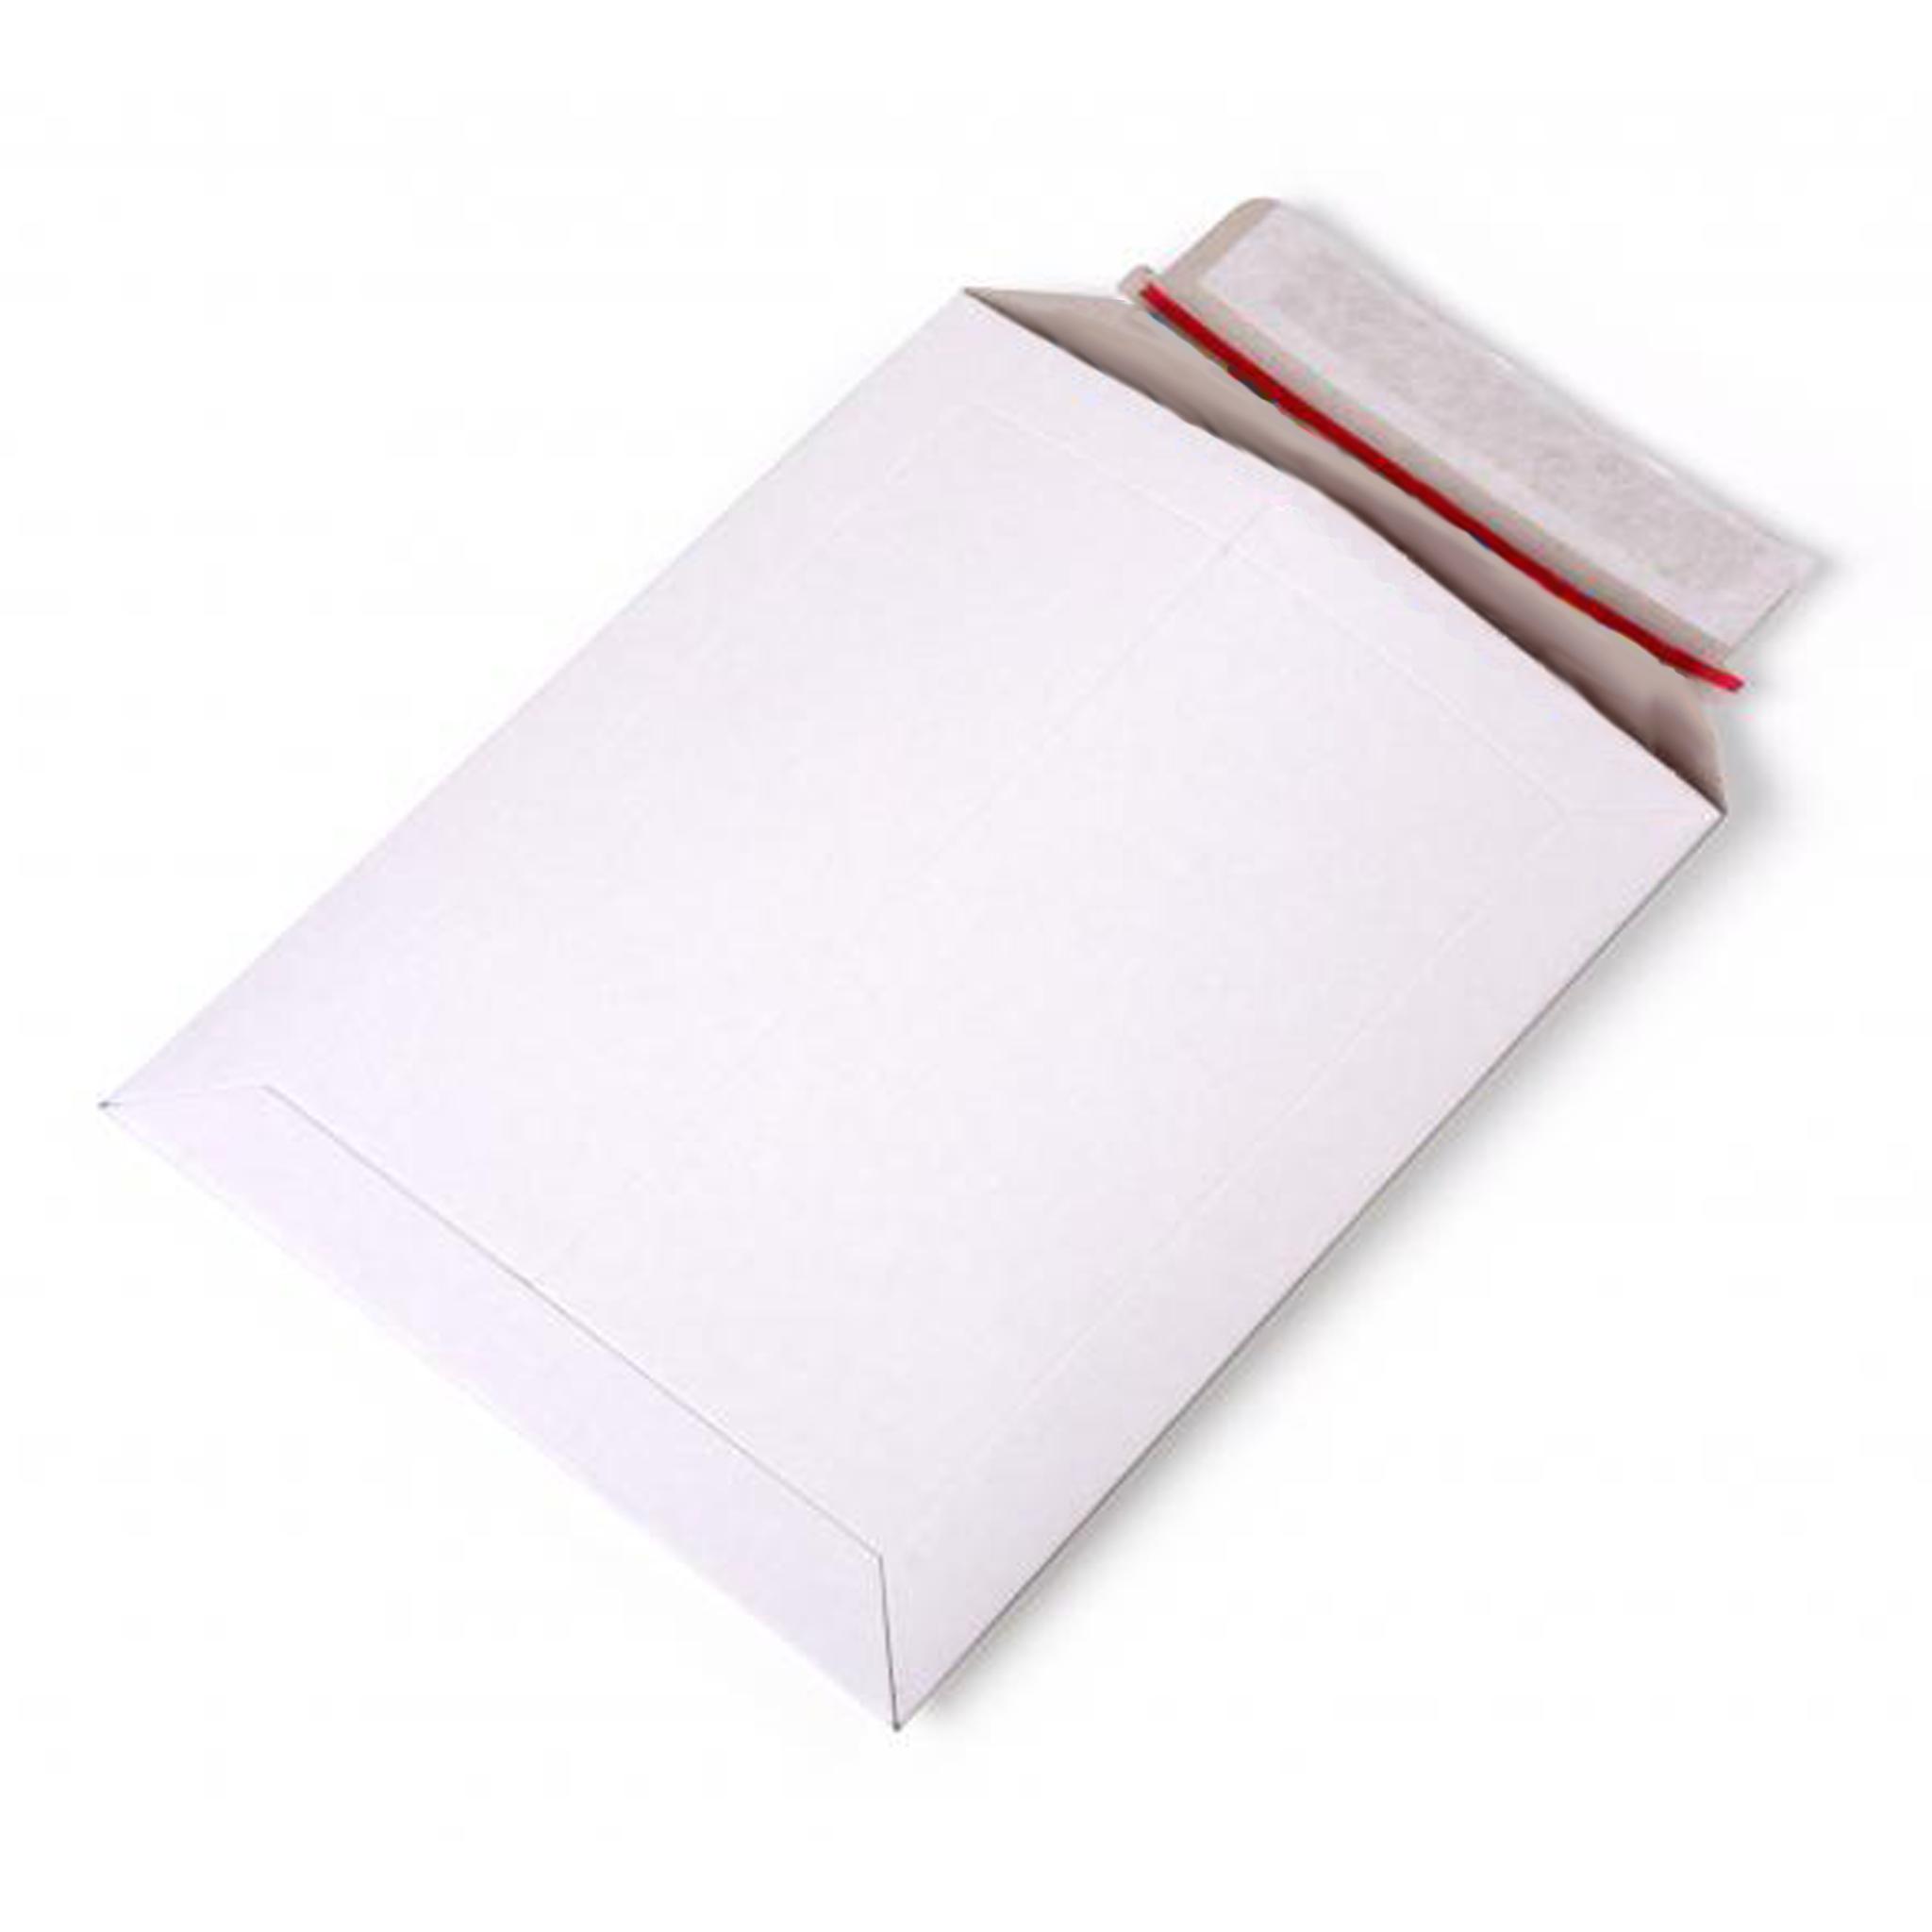 Kartonnen enveloppen 229 x 324 mm (A4) pakje van 100 stuks